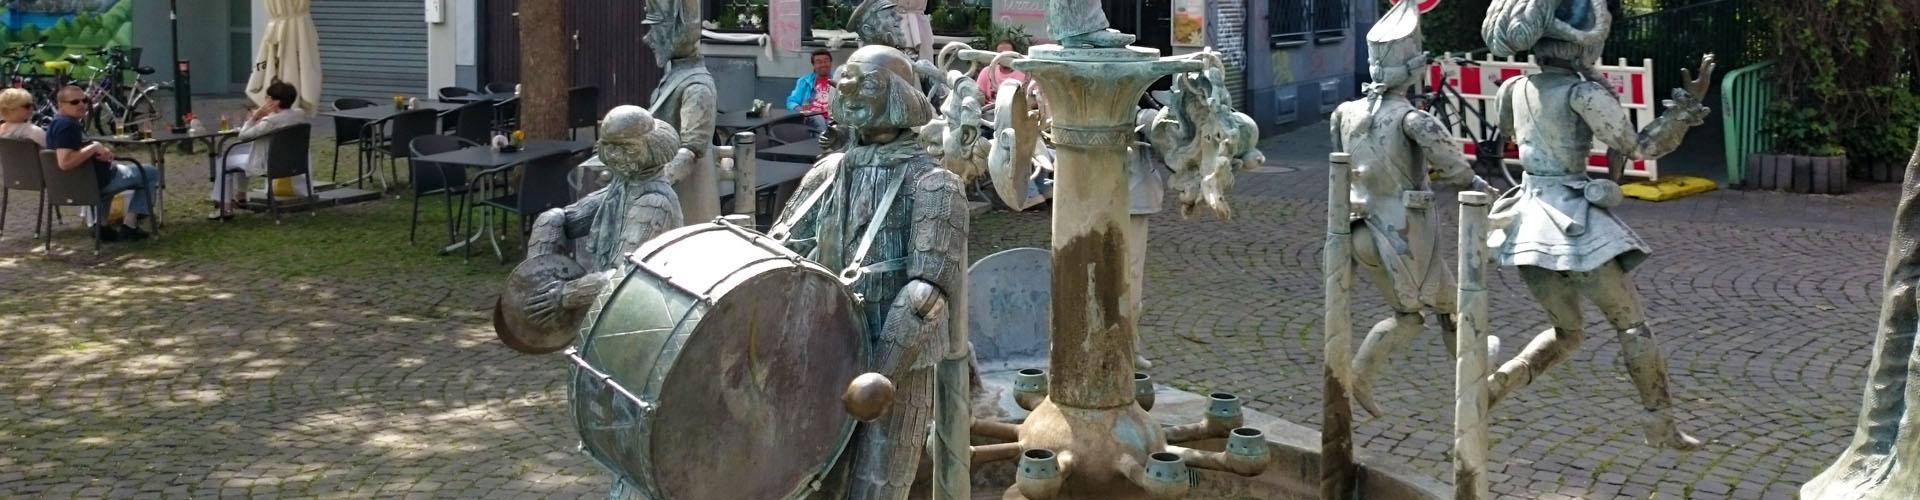 Karl-Berbuer-Platz